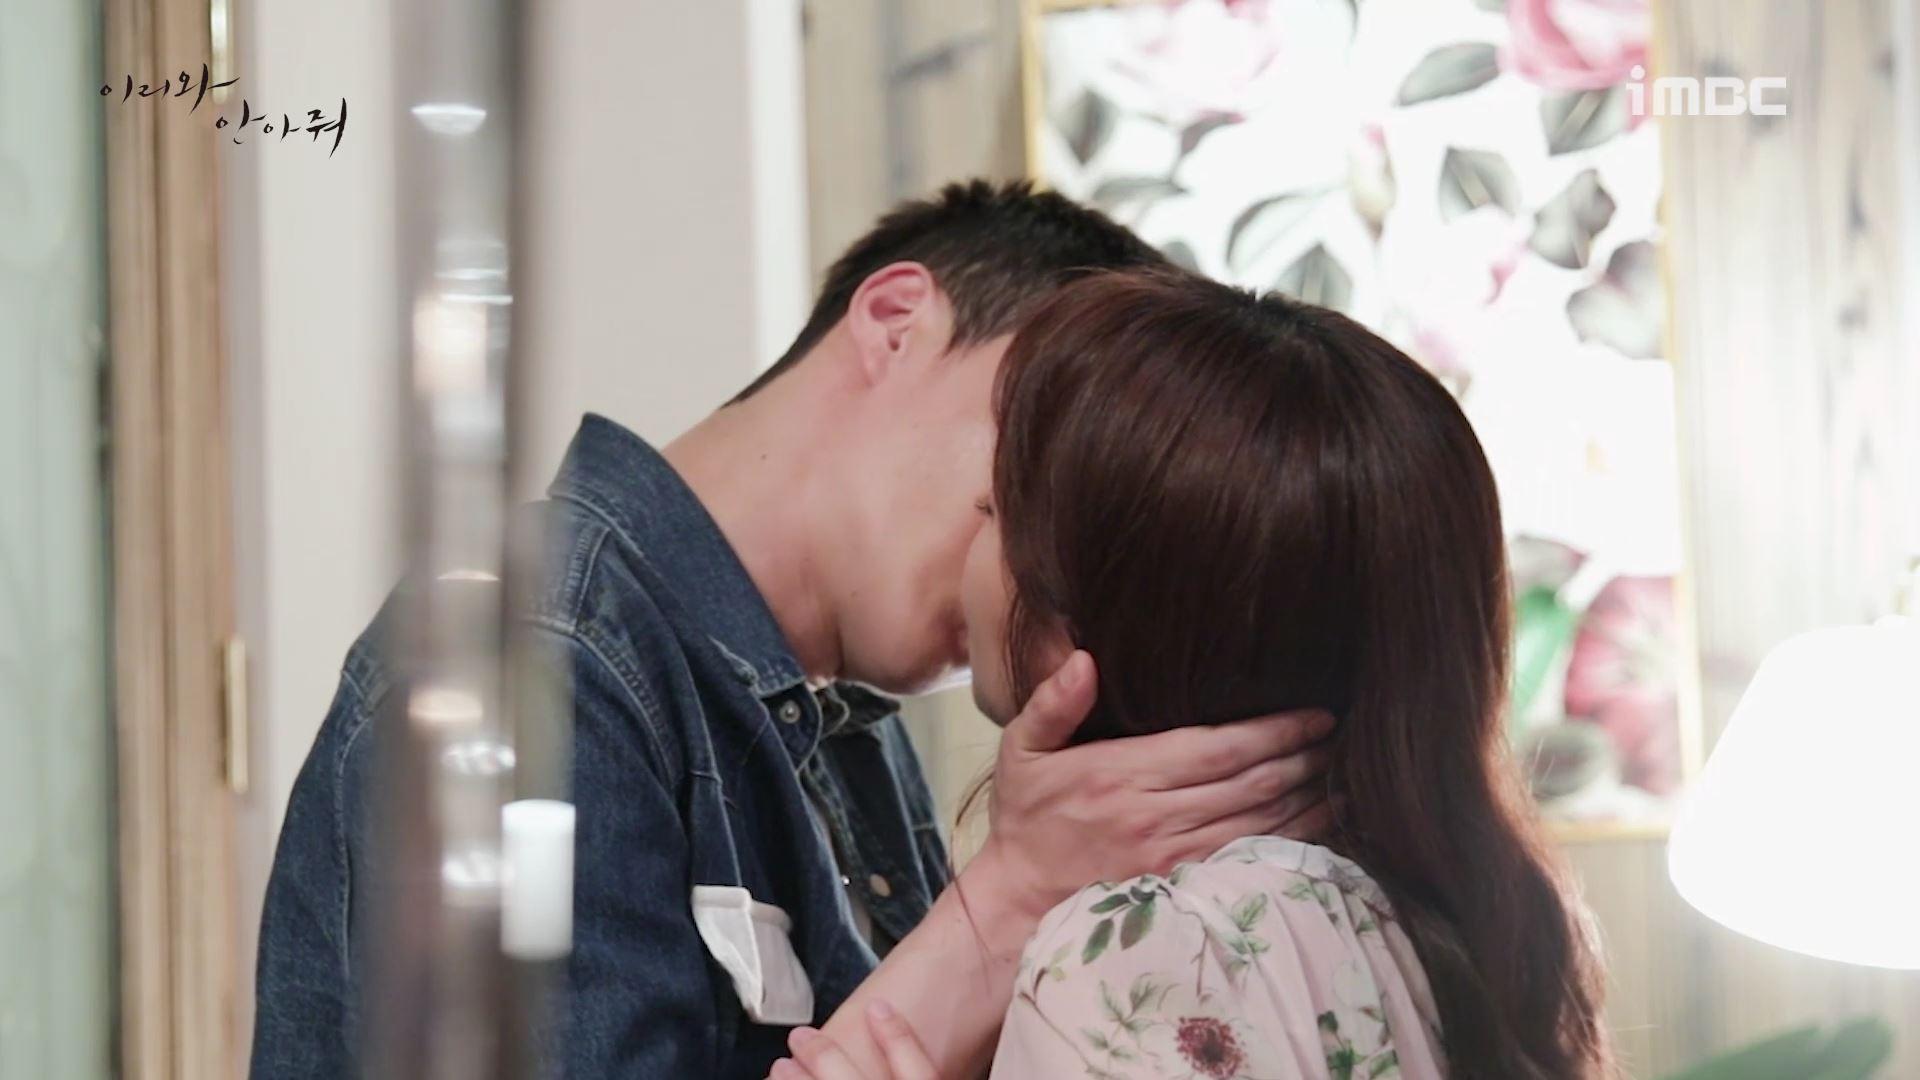 [M플레이] '이리와 안아줘' 장기용♡진기주, 12년 만의 첫 키스 현장 공개! 이미지-4